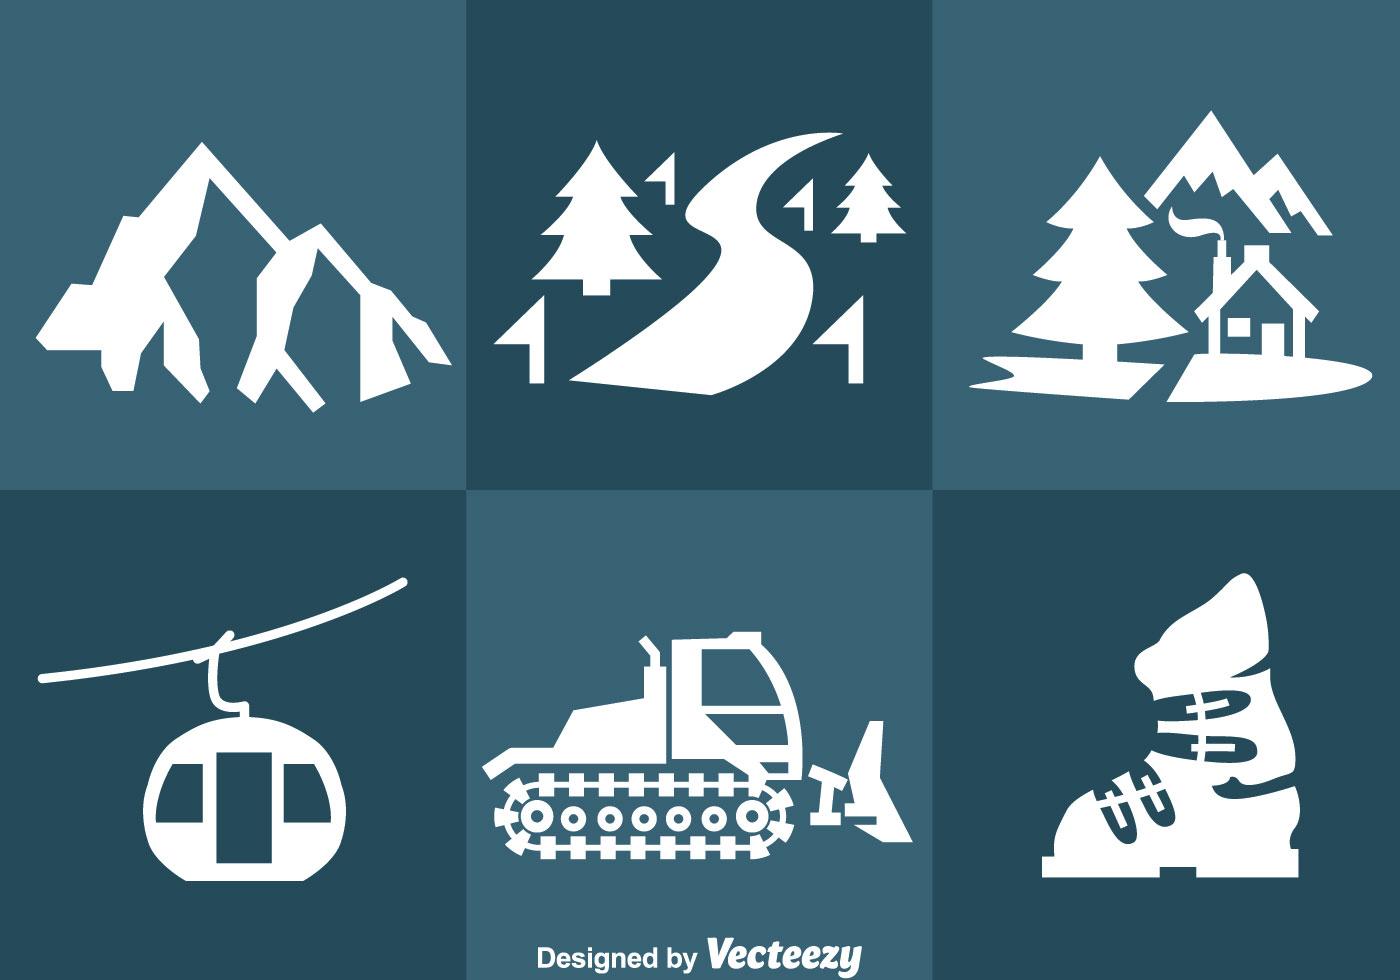 Snow Resort Icons Vector Download Free Vector Art Stock